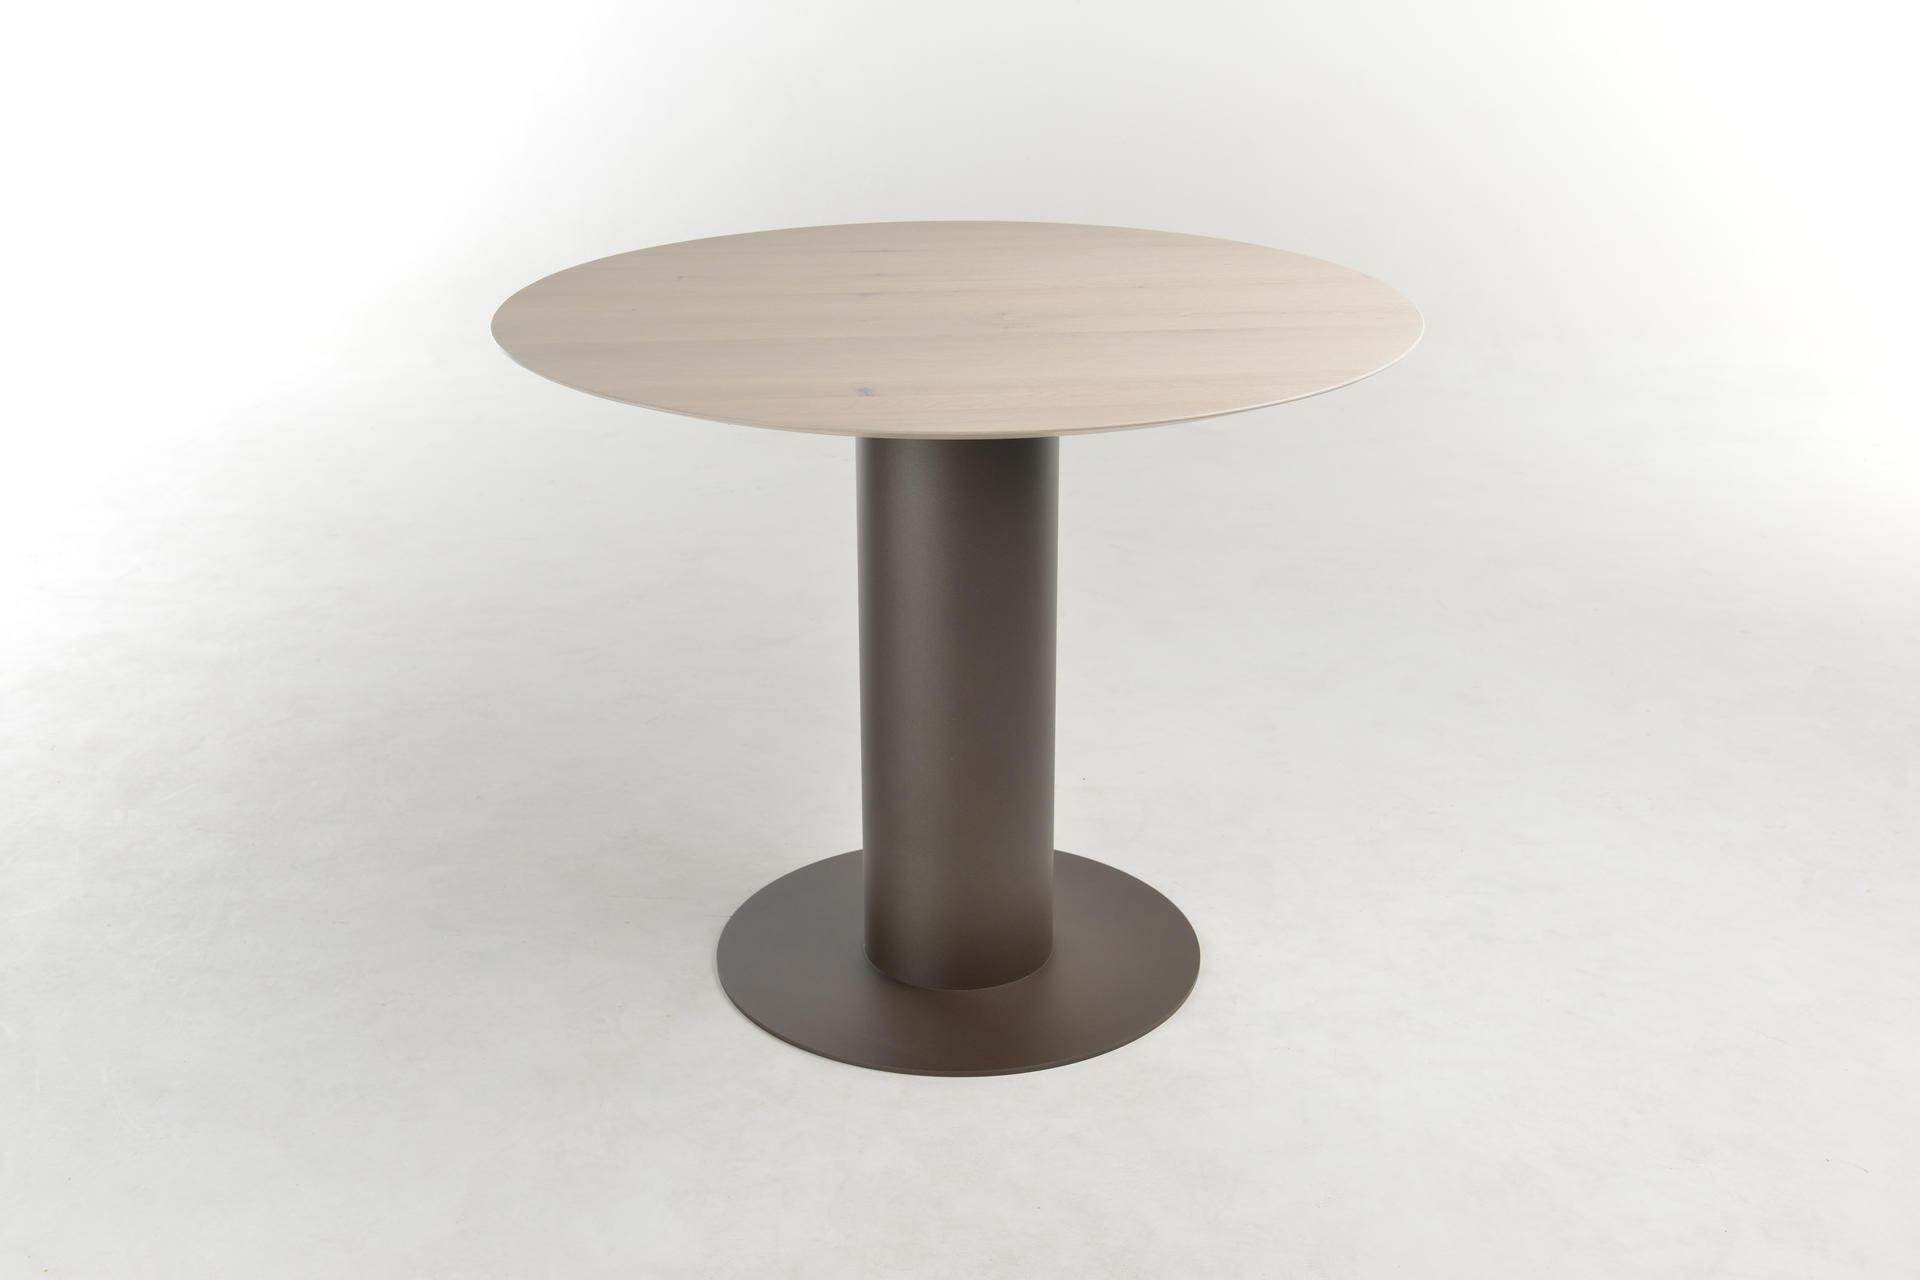 стол Oval, Bert Plantagie, фото 2